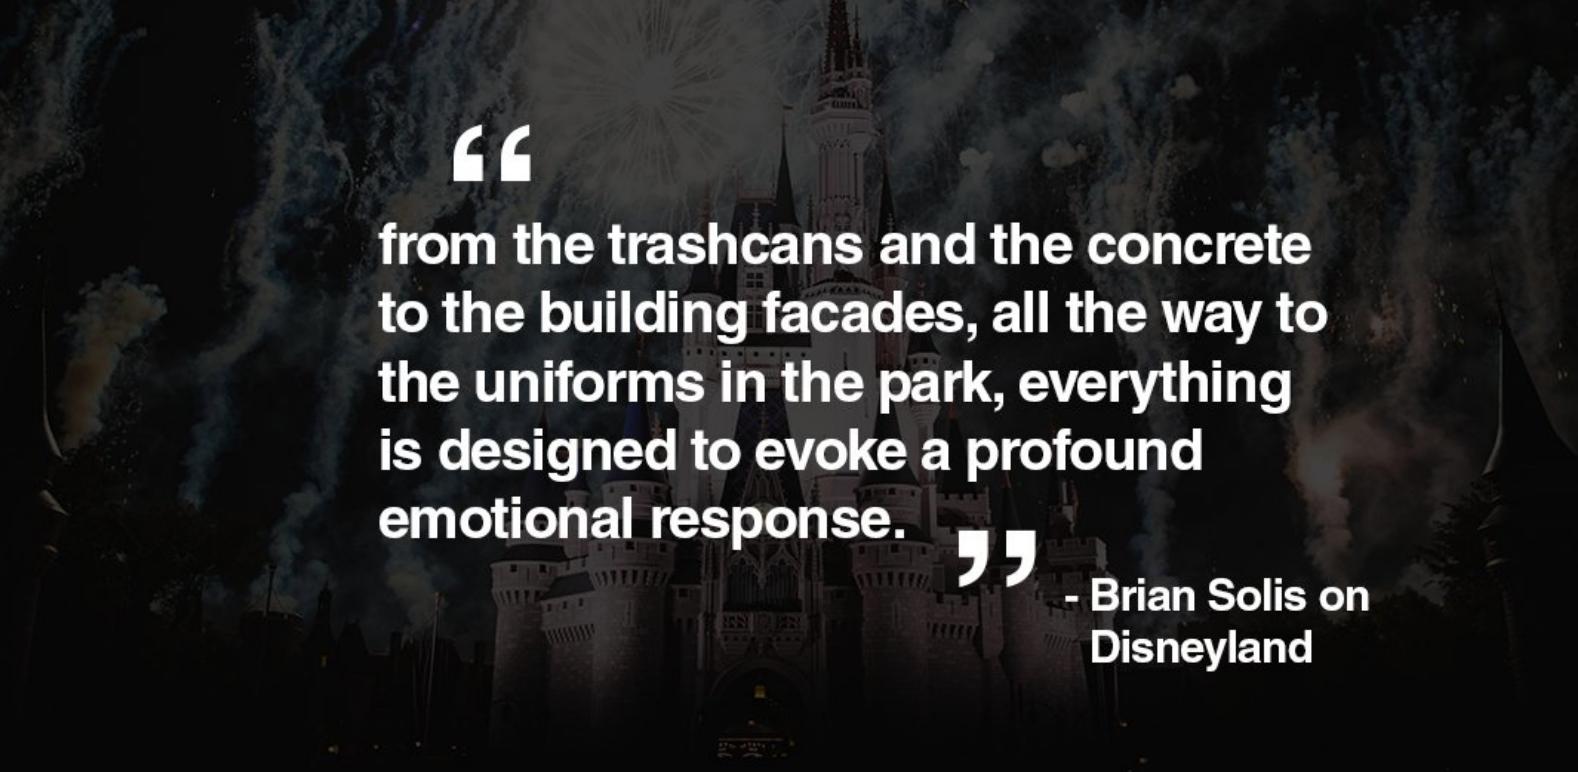 Senior Living Innovation Forum 2018 Futurist Brian Solis on Disneyland